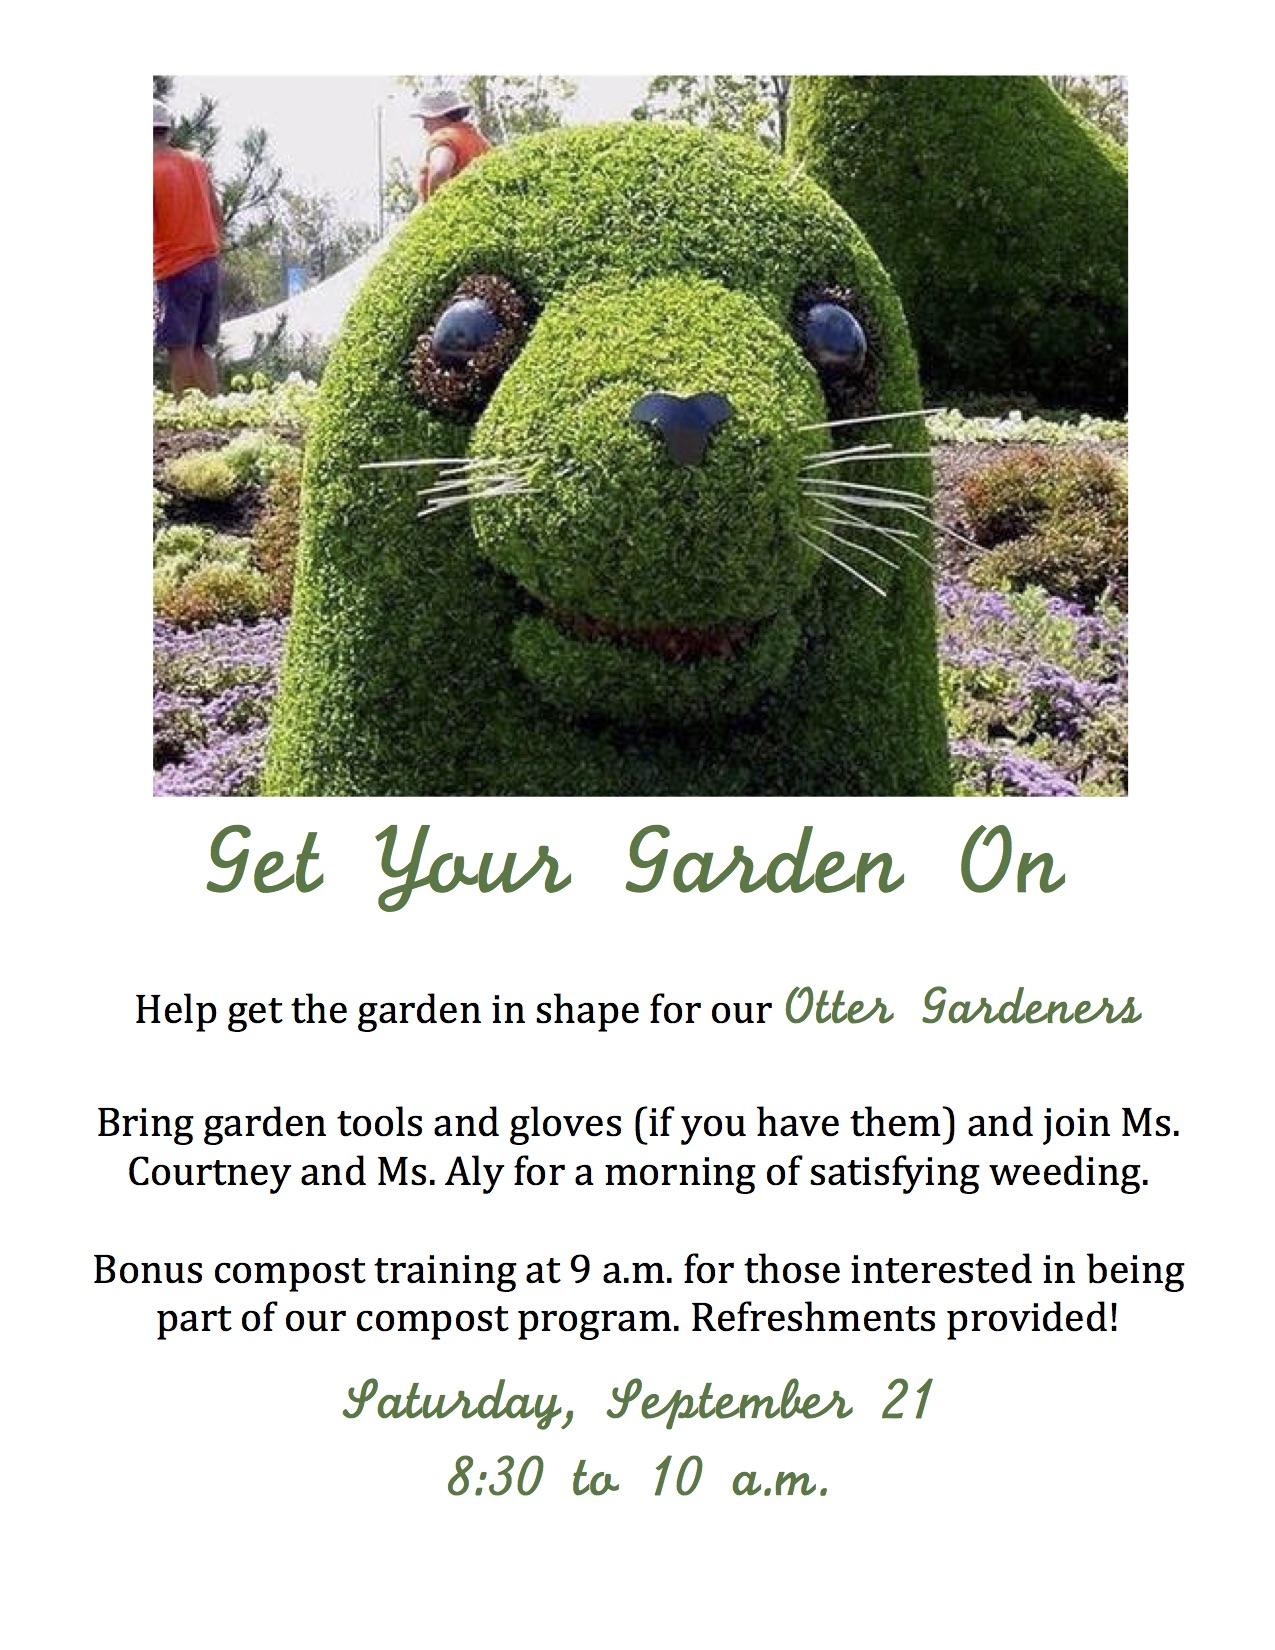 Garden Day Save the Date.jpg